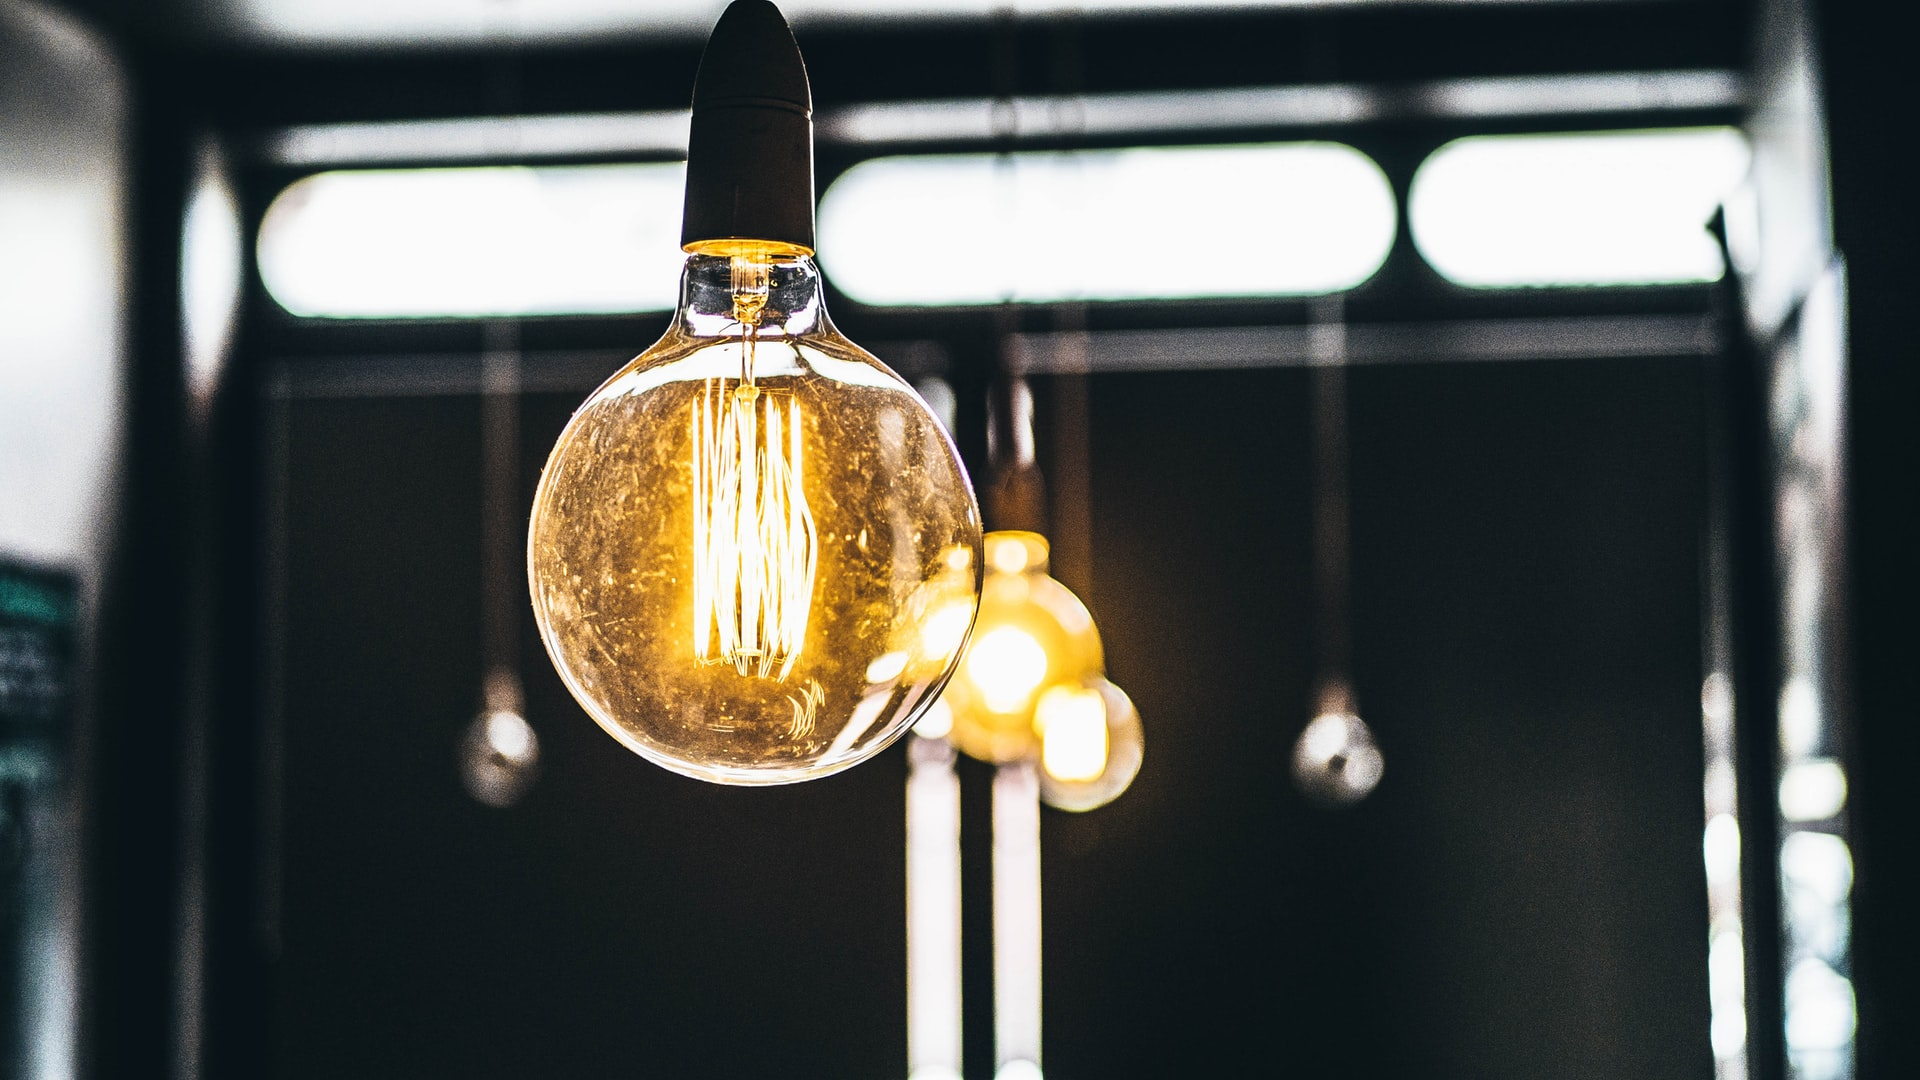 Aussies Best Electricity Gas Deals Header Image